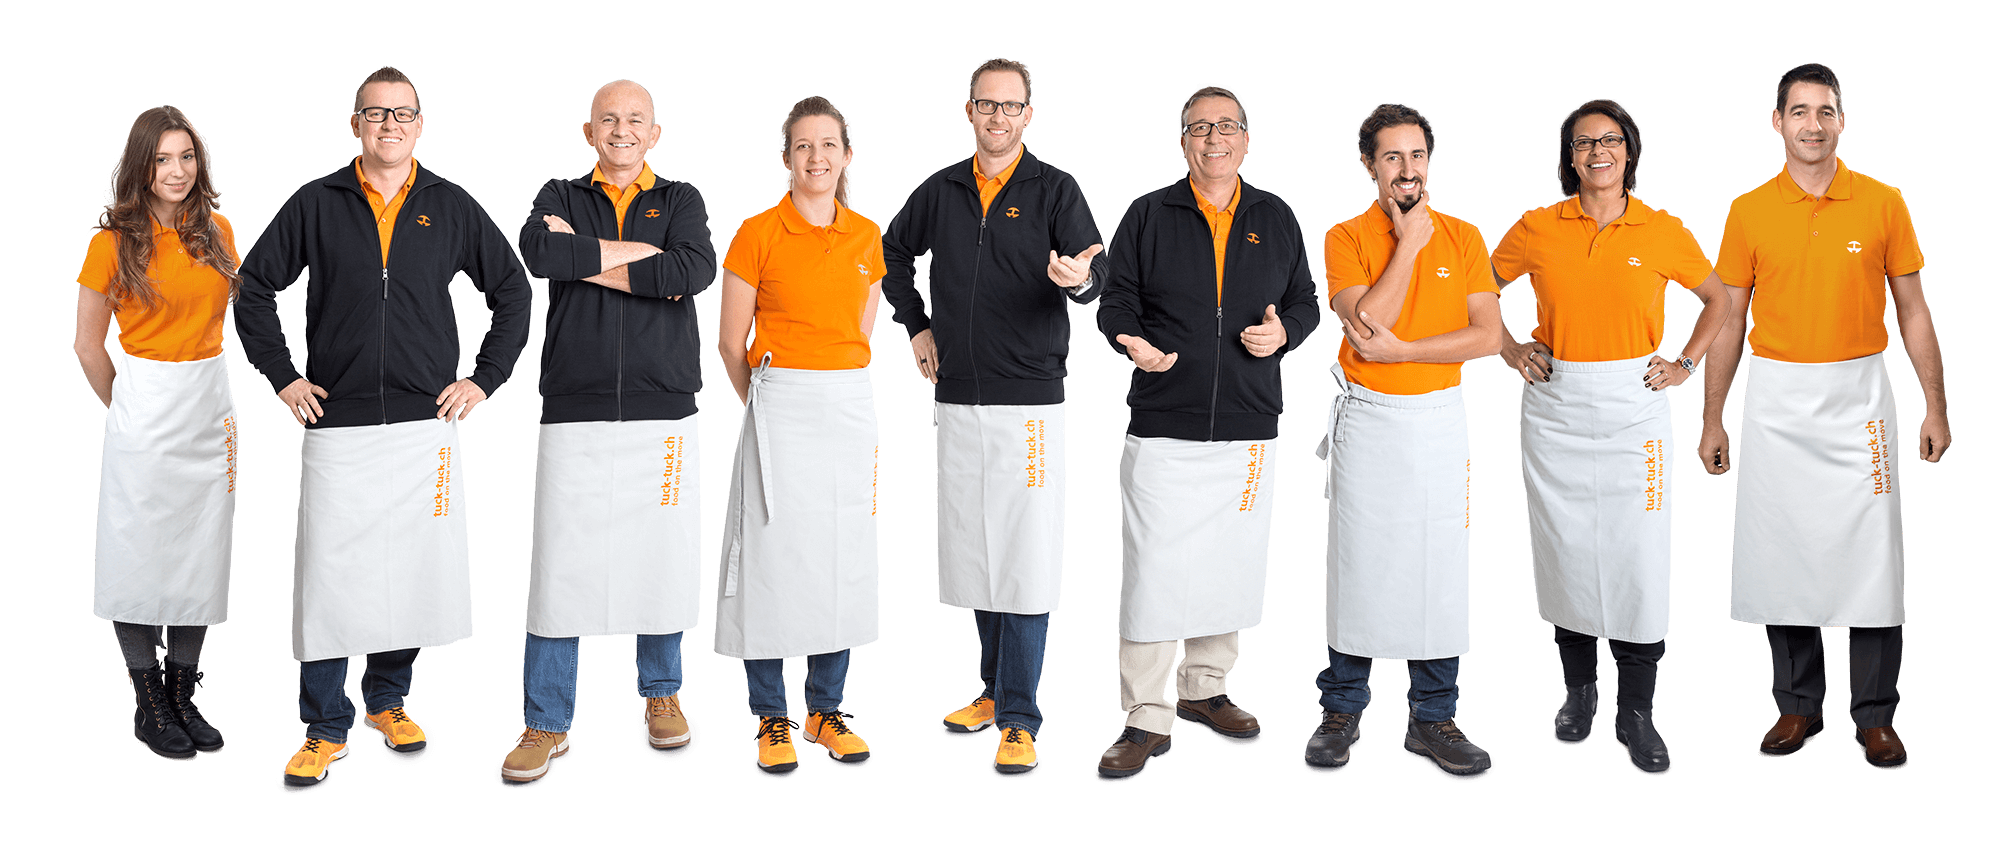 tuck-tuck team